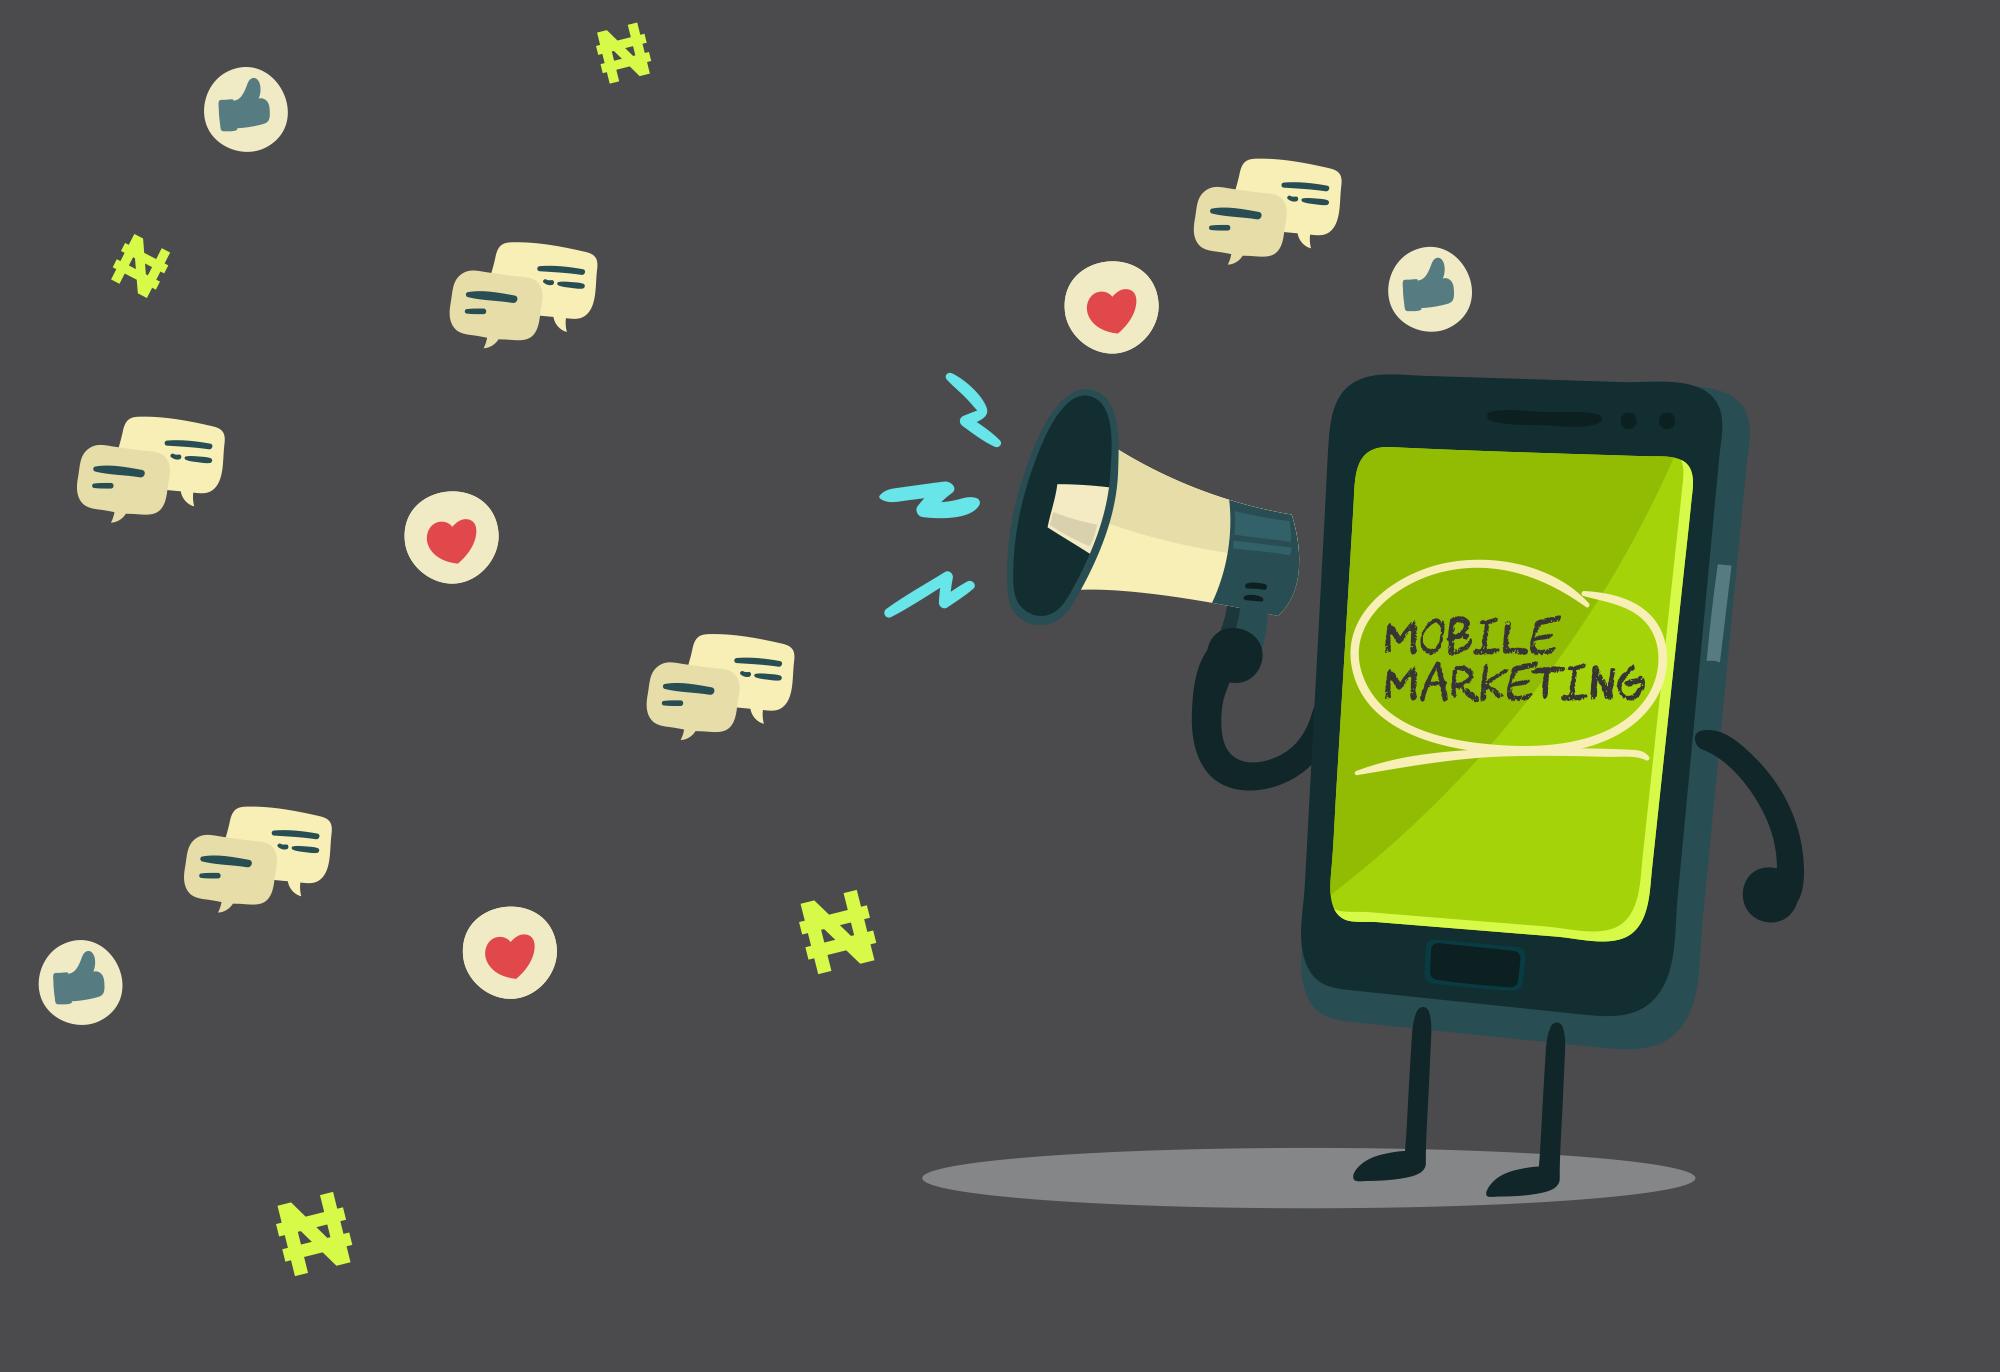 mobile marketing tips by bulk sms nigeria